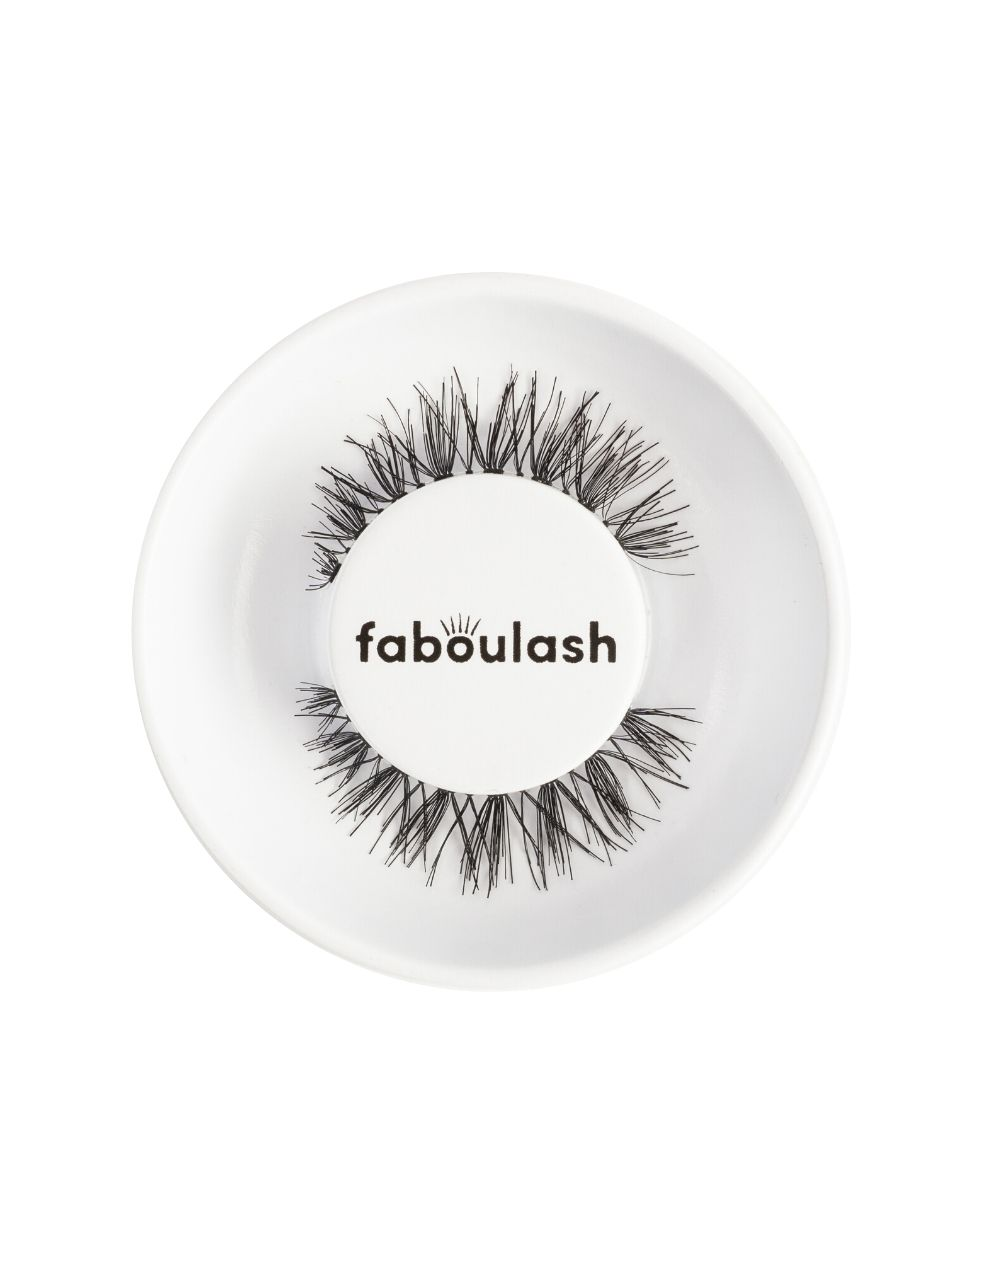 Faboulash BBWSP by Faboulash